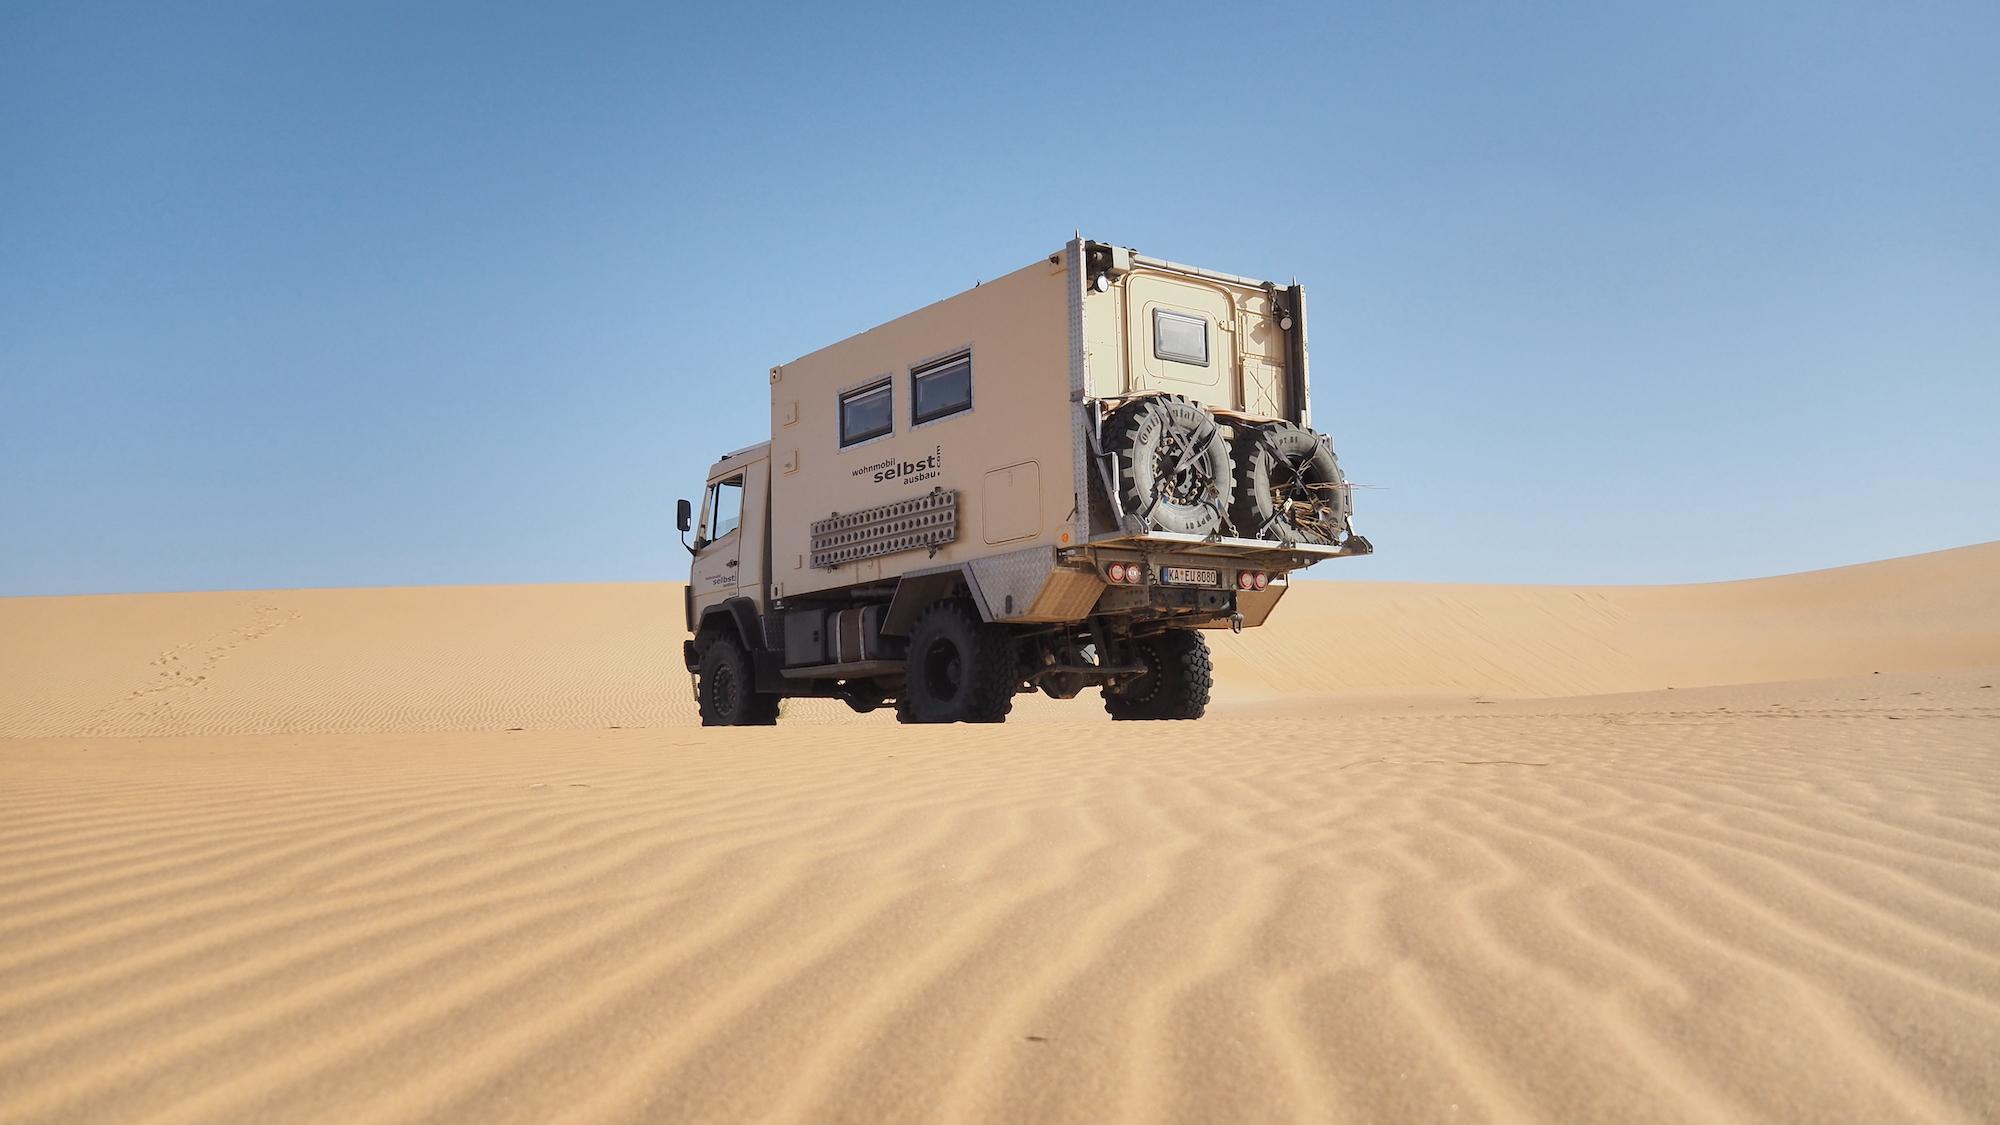 Wohnmobil-Ausbau Expeditionsmobil-Ausbau